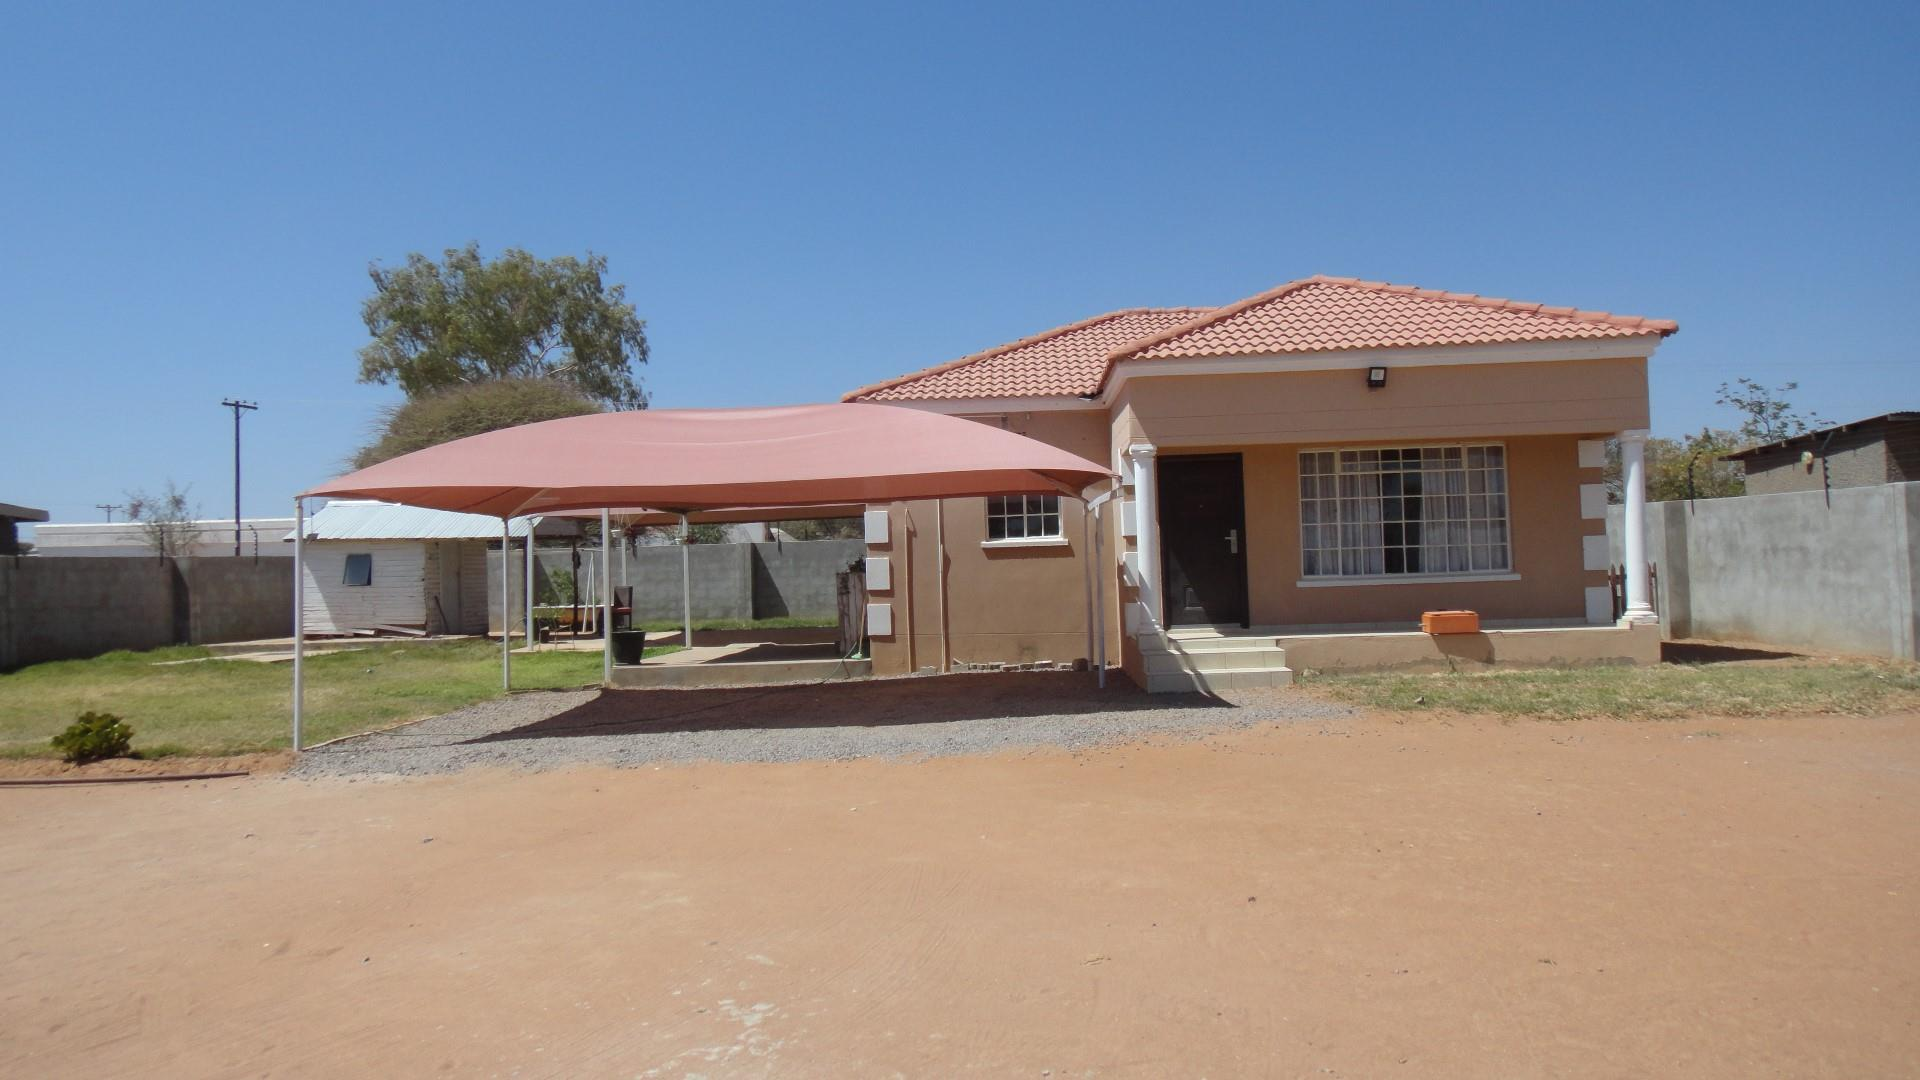 2 Bedroom House For Sale in Metsimotlhaba Central